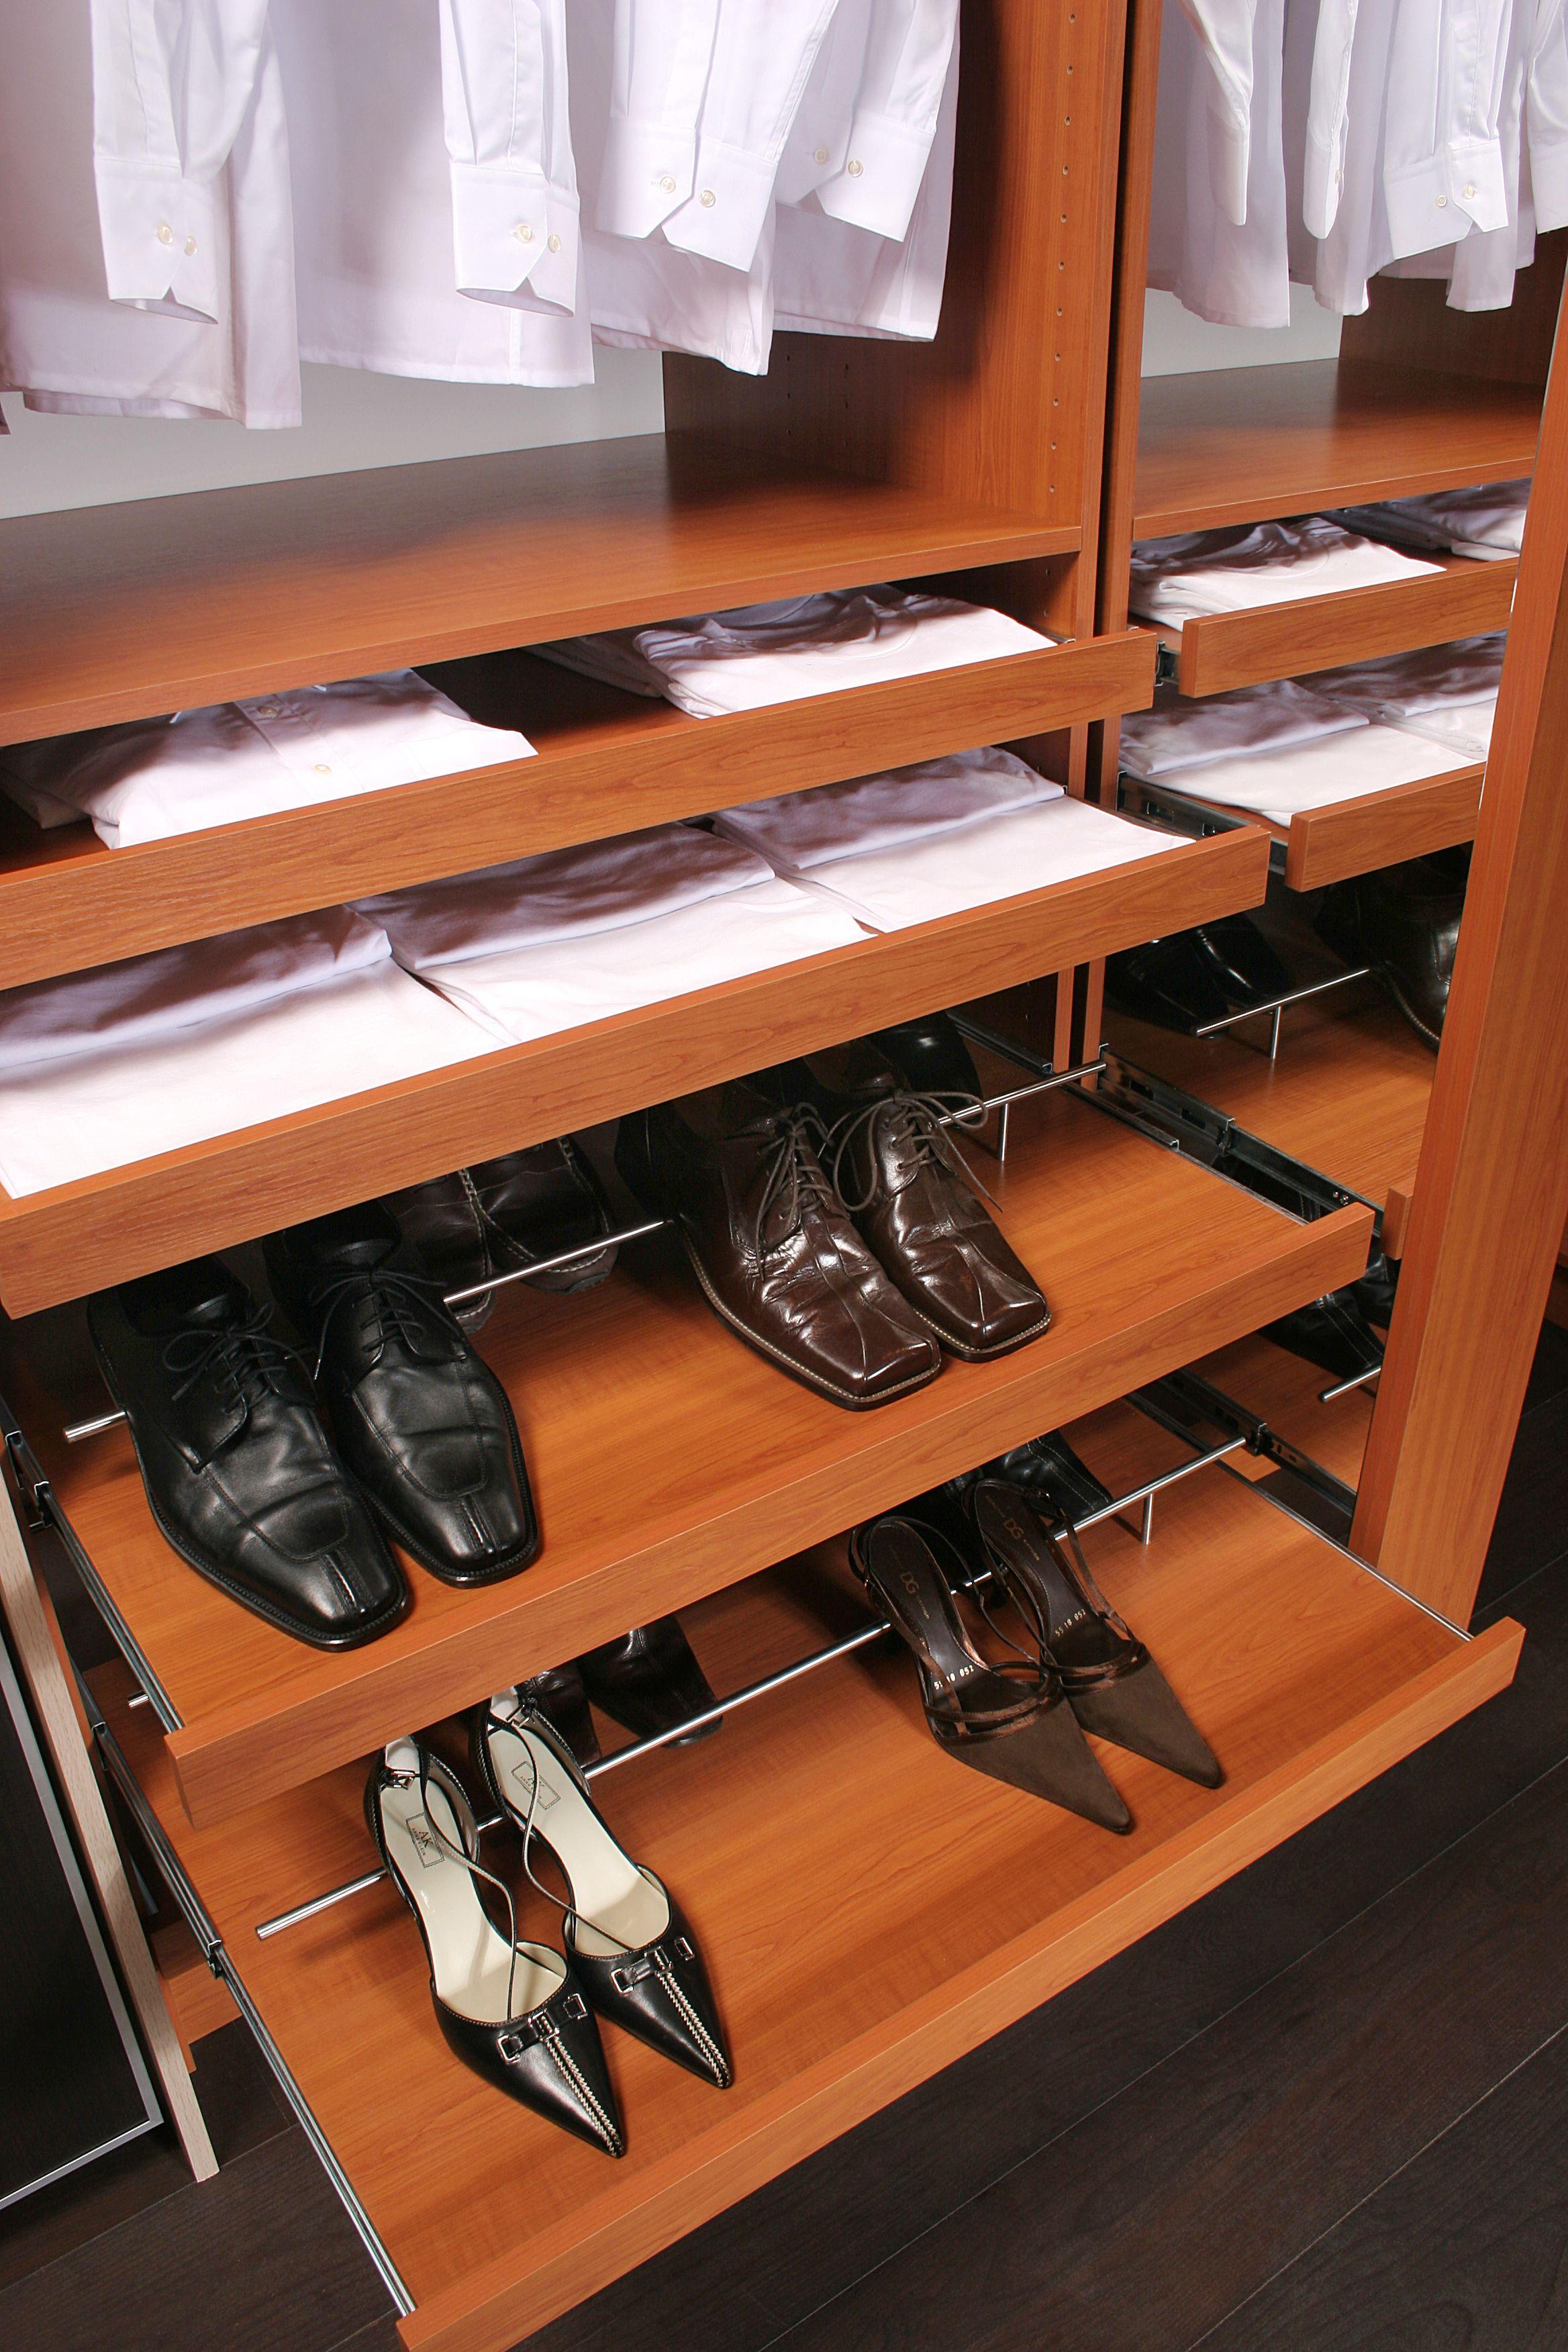 Zapatera Closet Designs Shoe Rack Walk In Closet